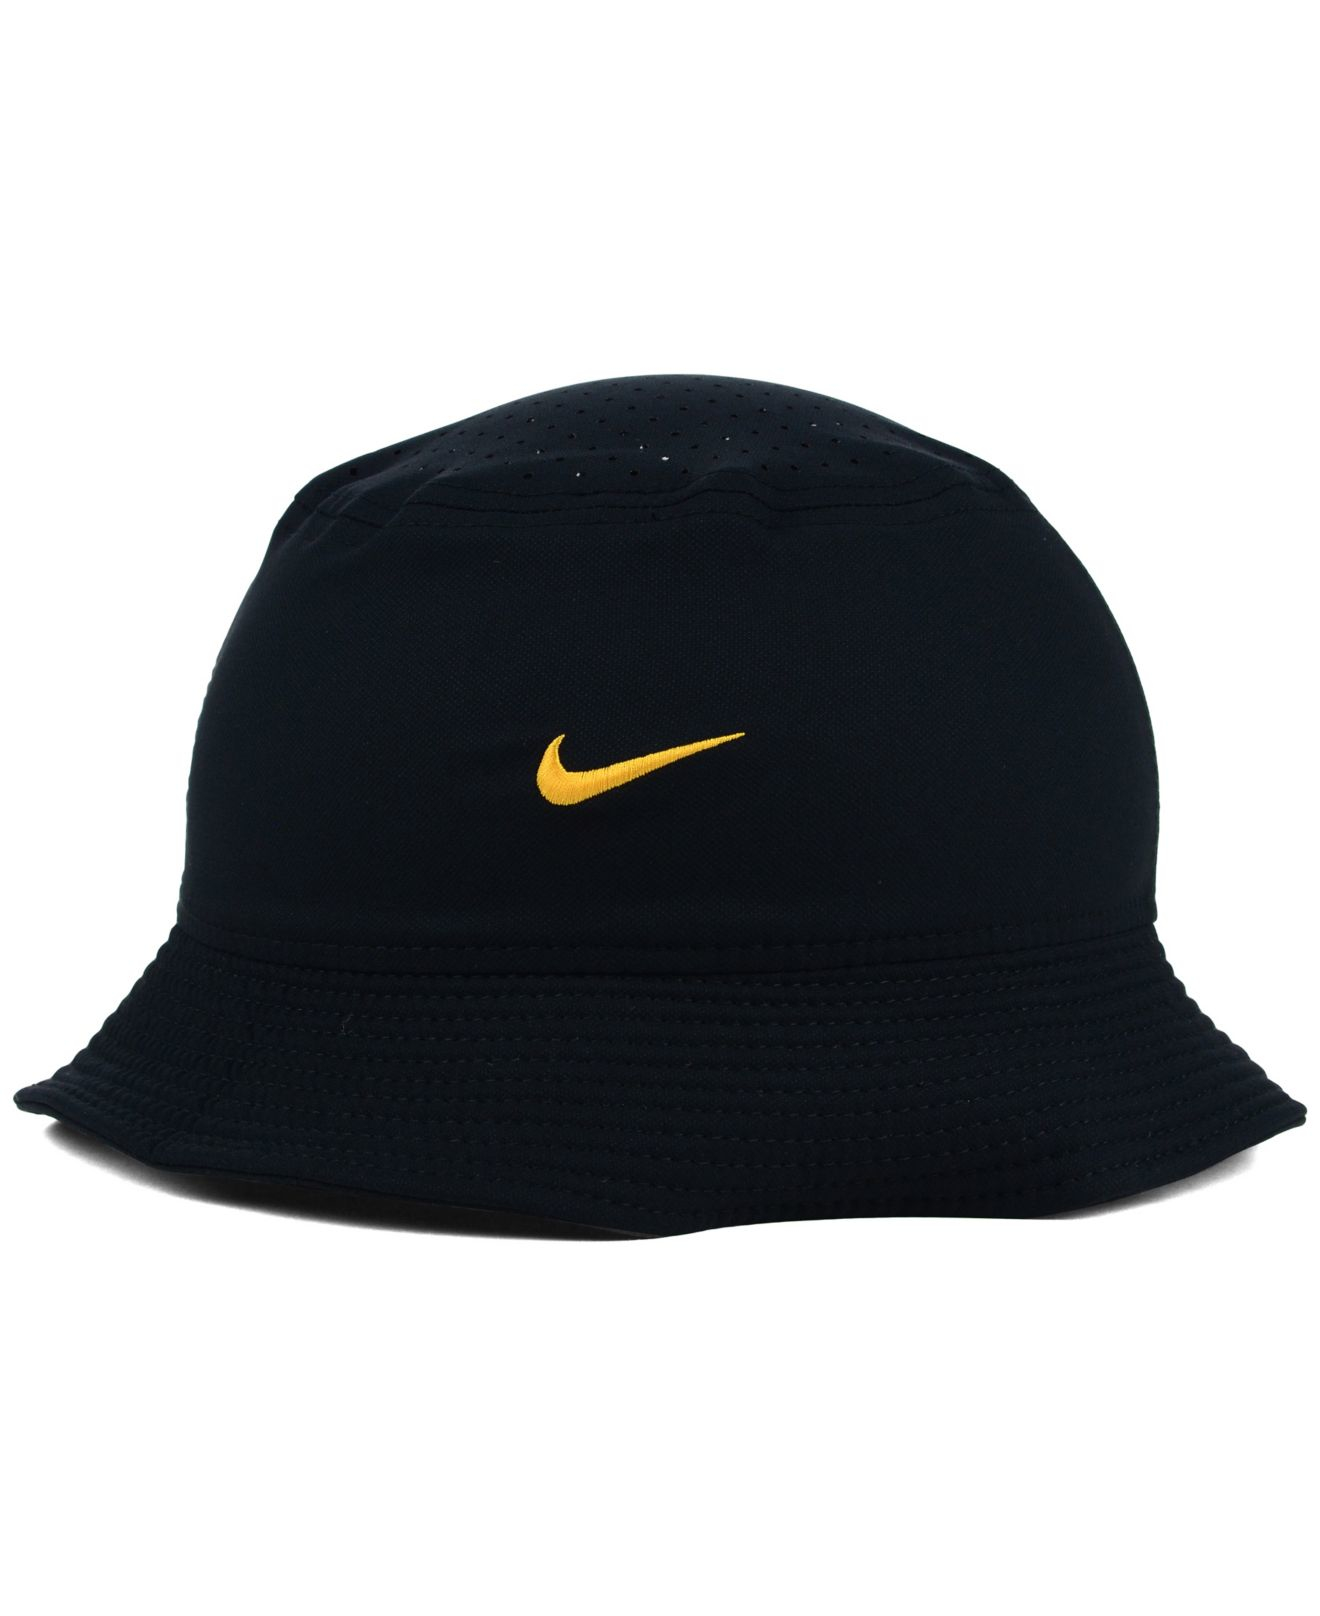 7e0d322a1be best price iowa bucket hat 7115c 6488f